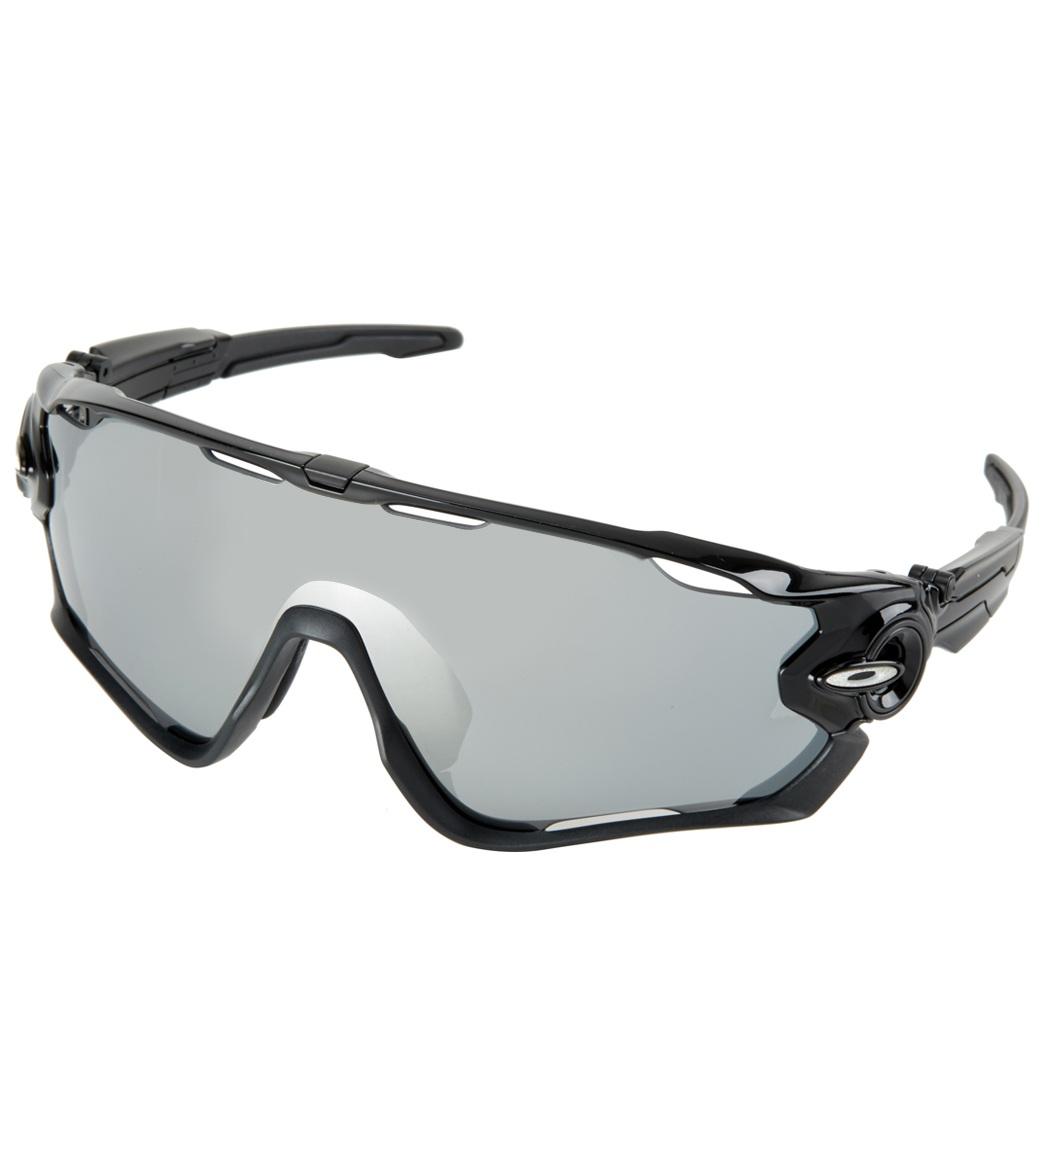 afb1394e6e Oakley Men s Jawbreaker Iridium Lens Sunglasses at SwimOutlet.com - Free  Shipping